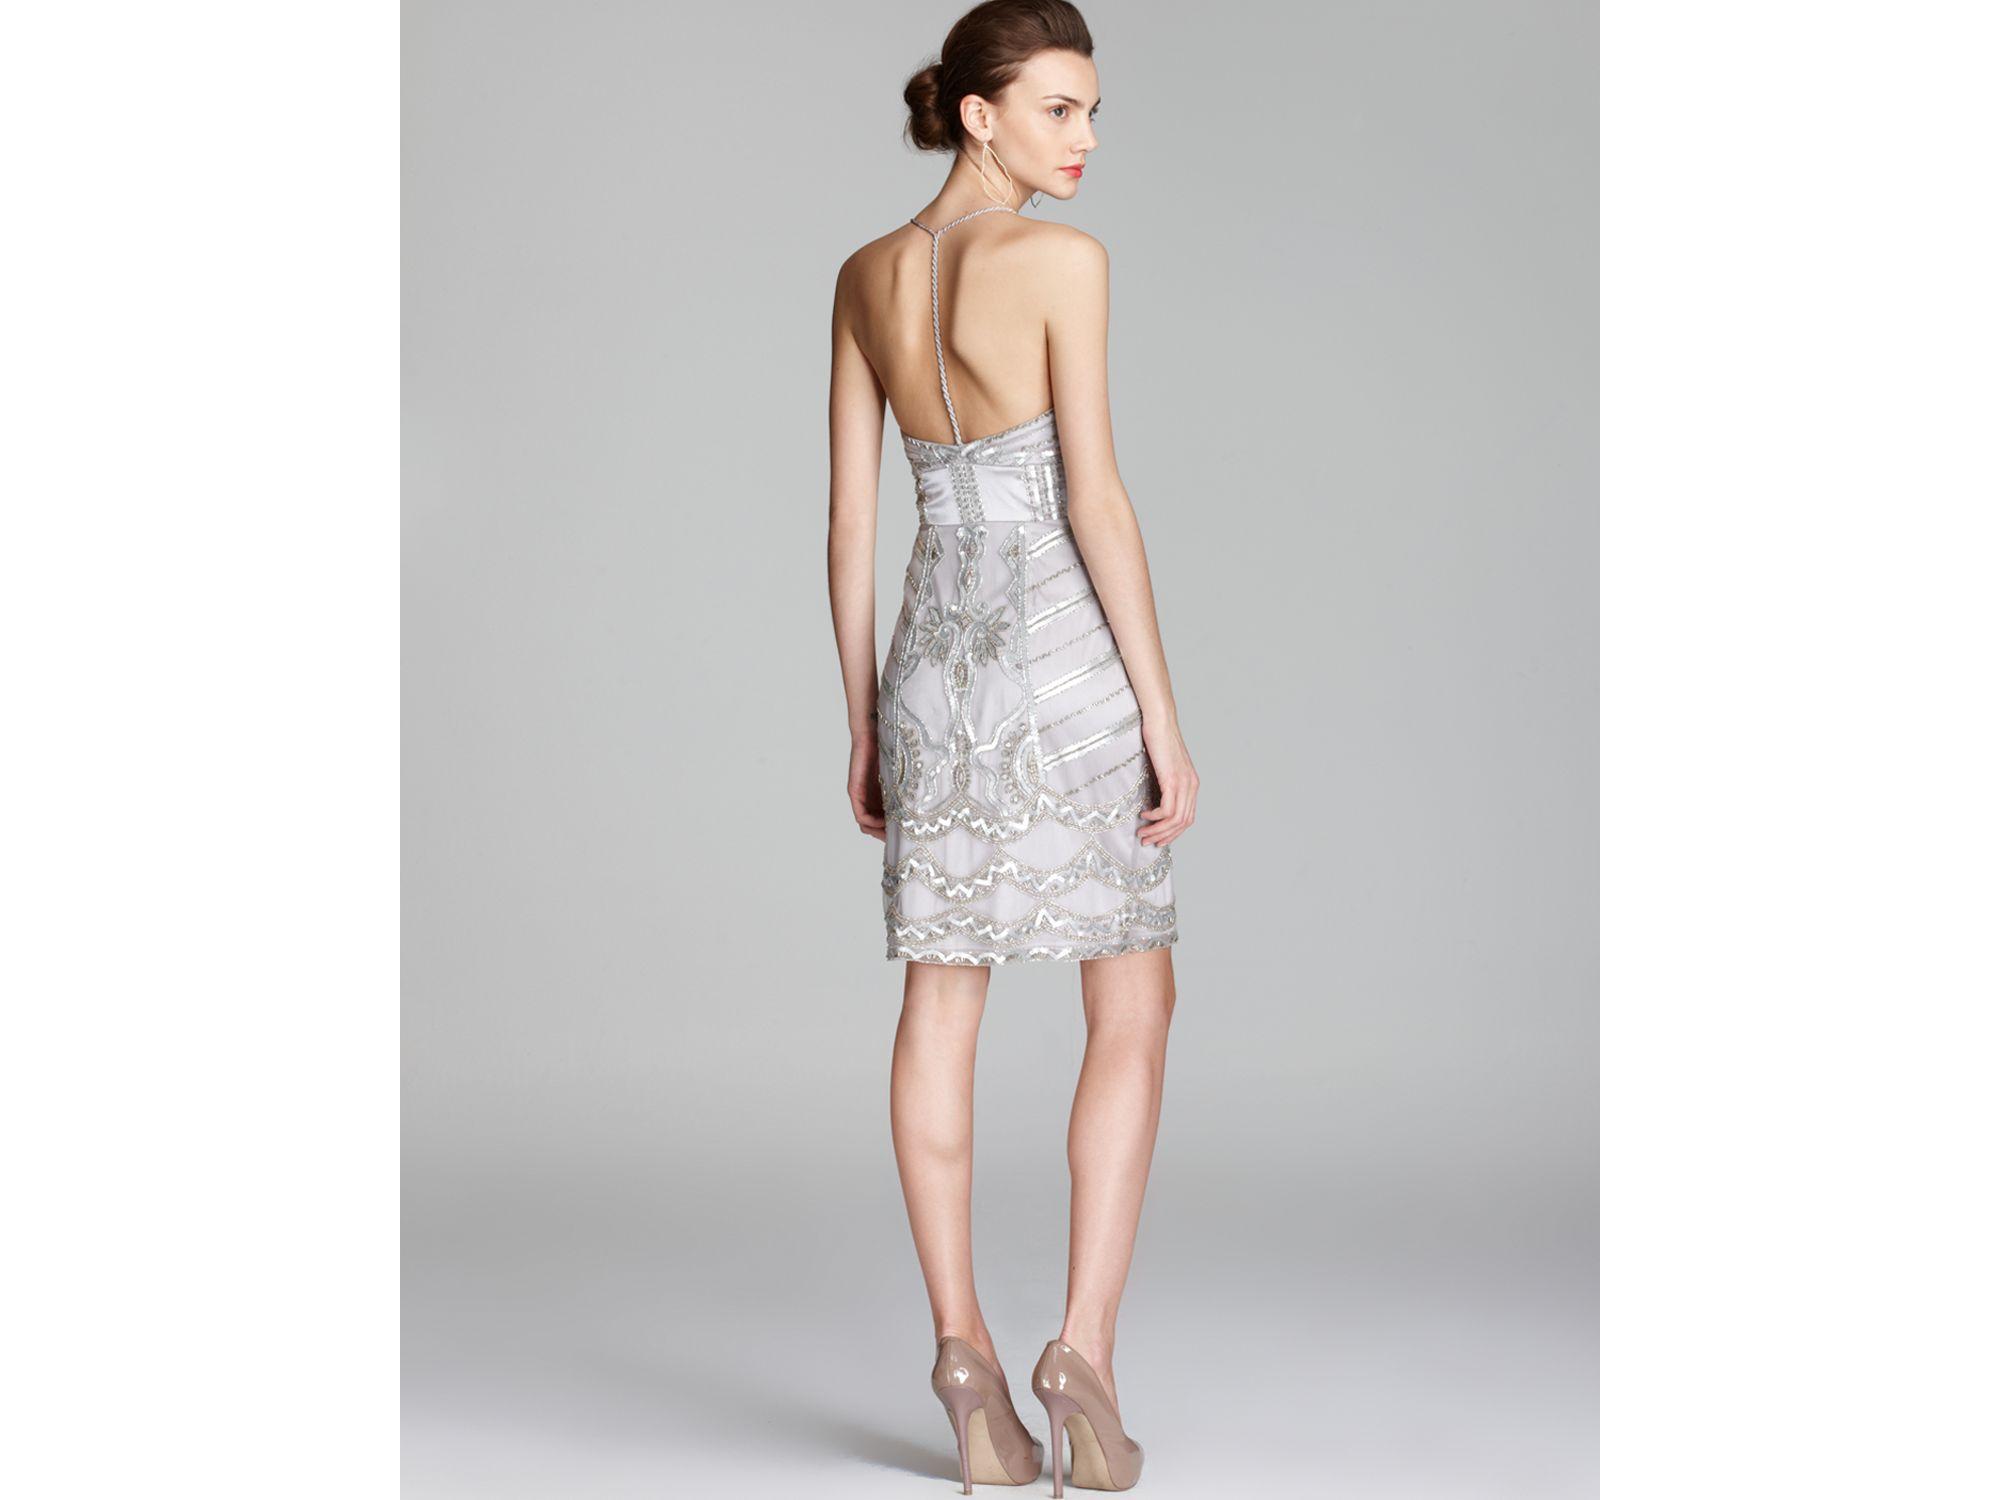 d510b8c2a1e Lyst - Sue Wong Halter Dress V Neck Beaded in Metallic